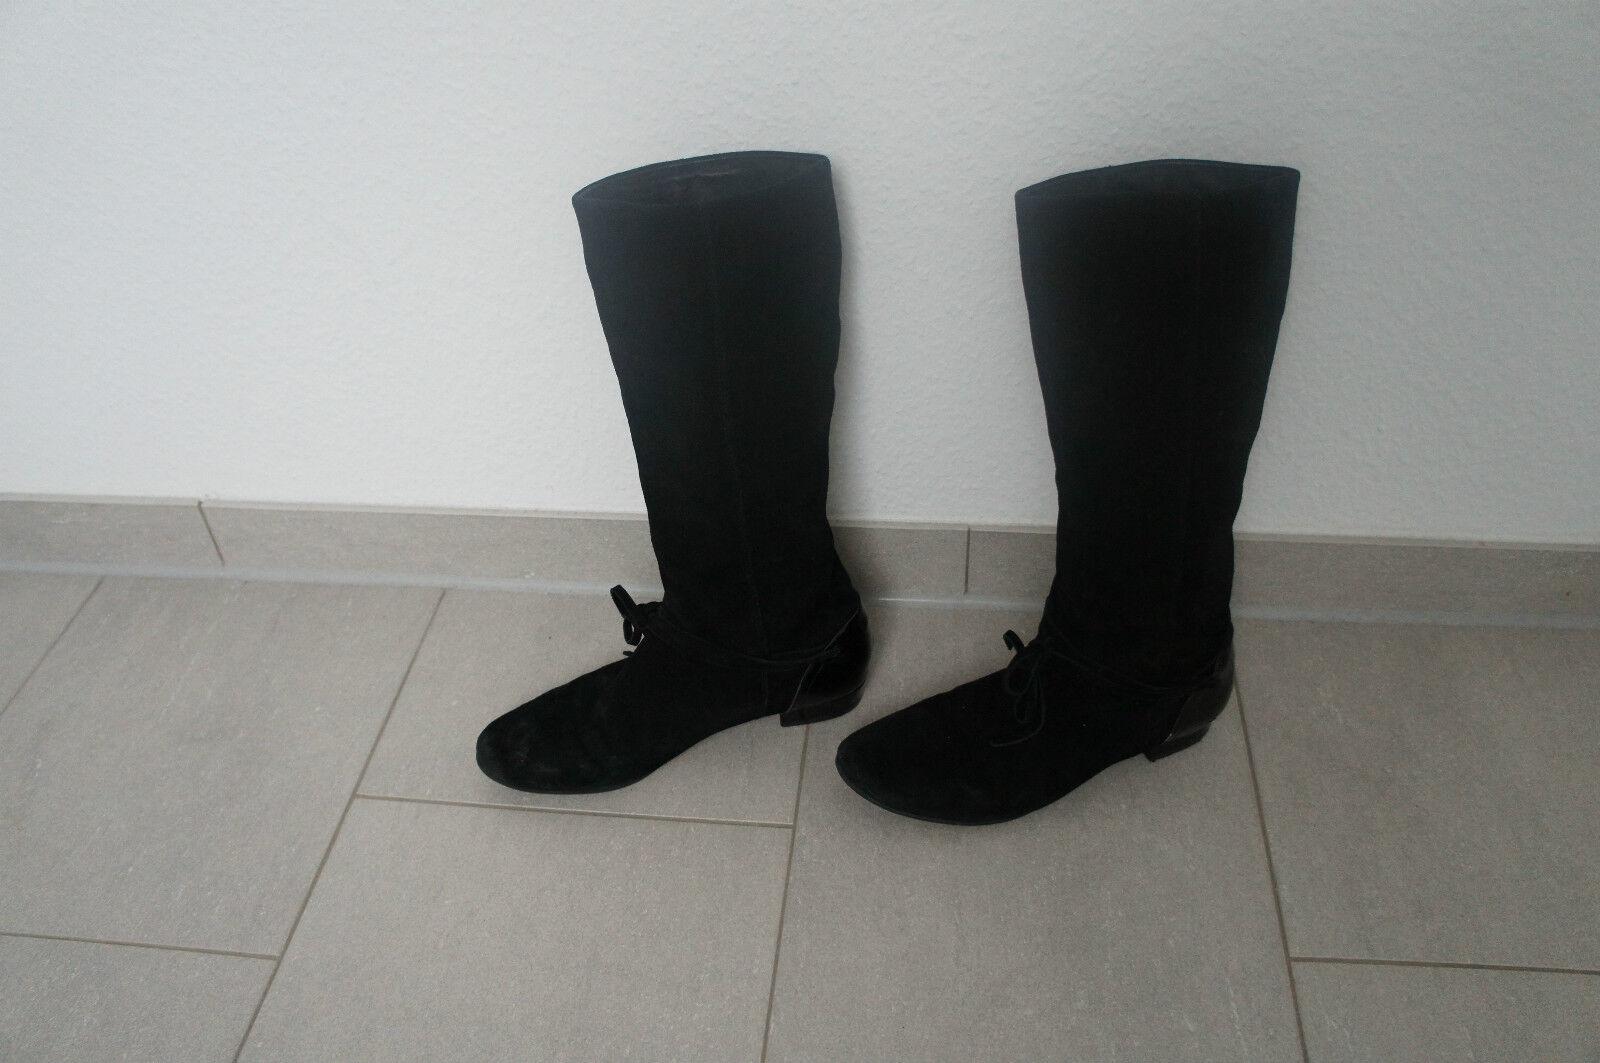 Stiefel Damen Lacoste Größe EDEL 40,5 schwarz w. neu EDEL Größe TOP fc67a7